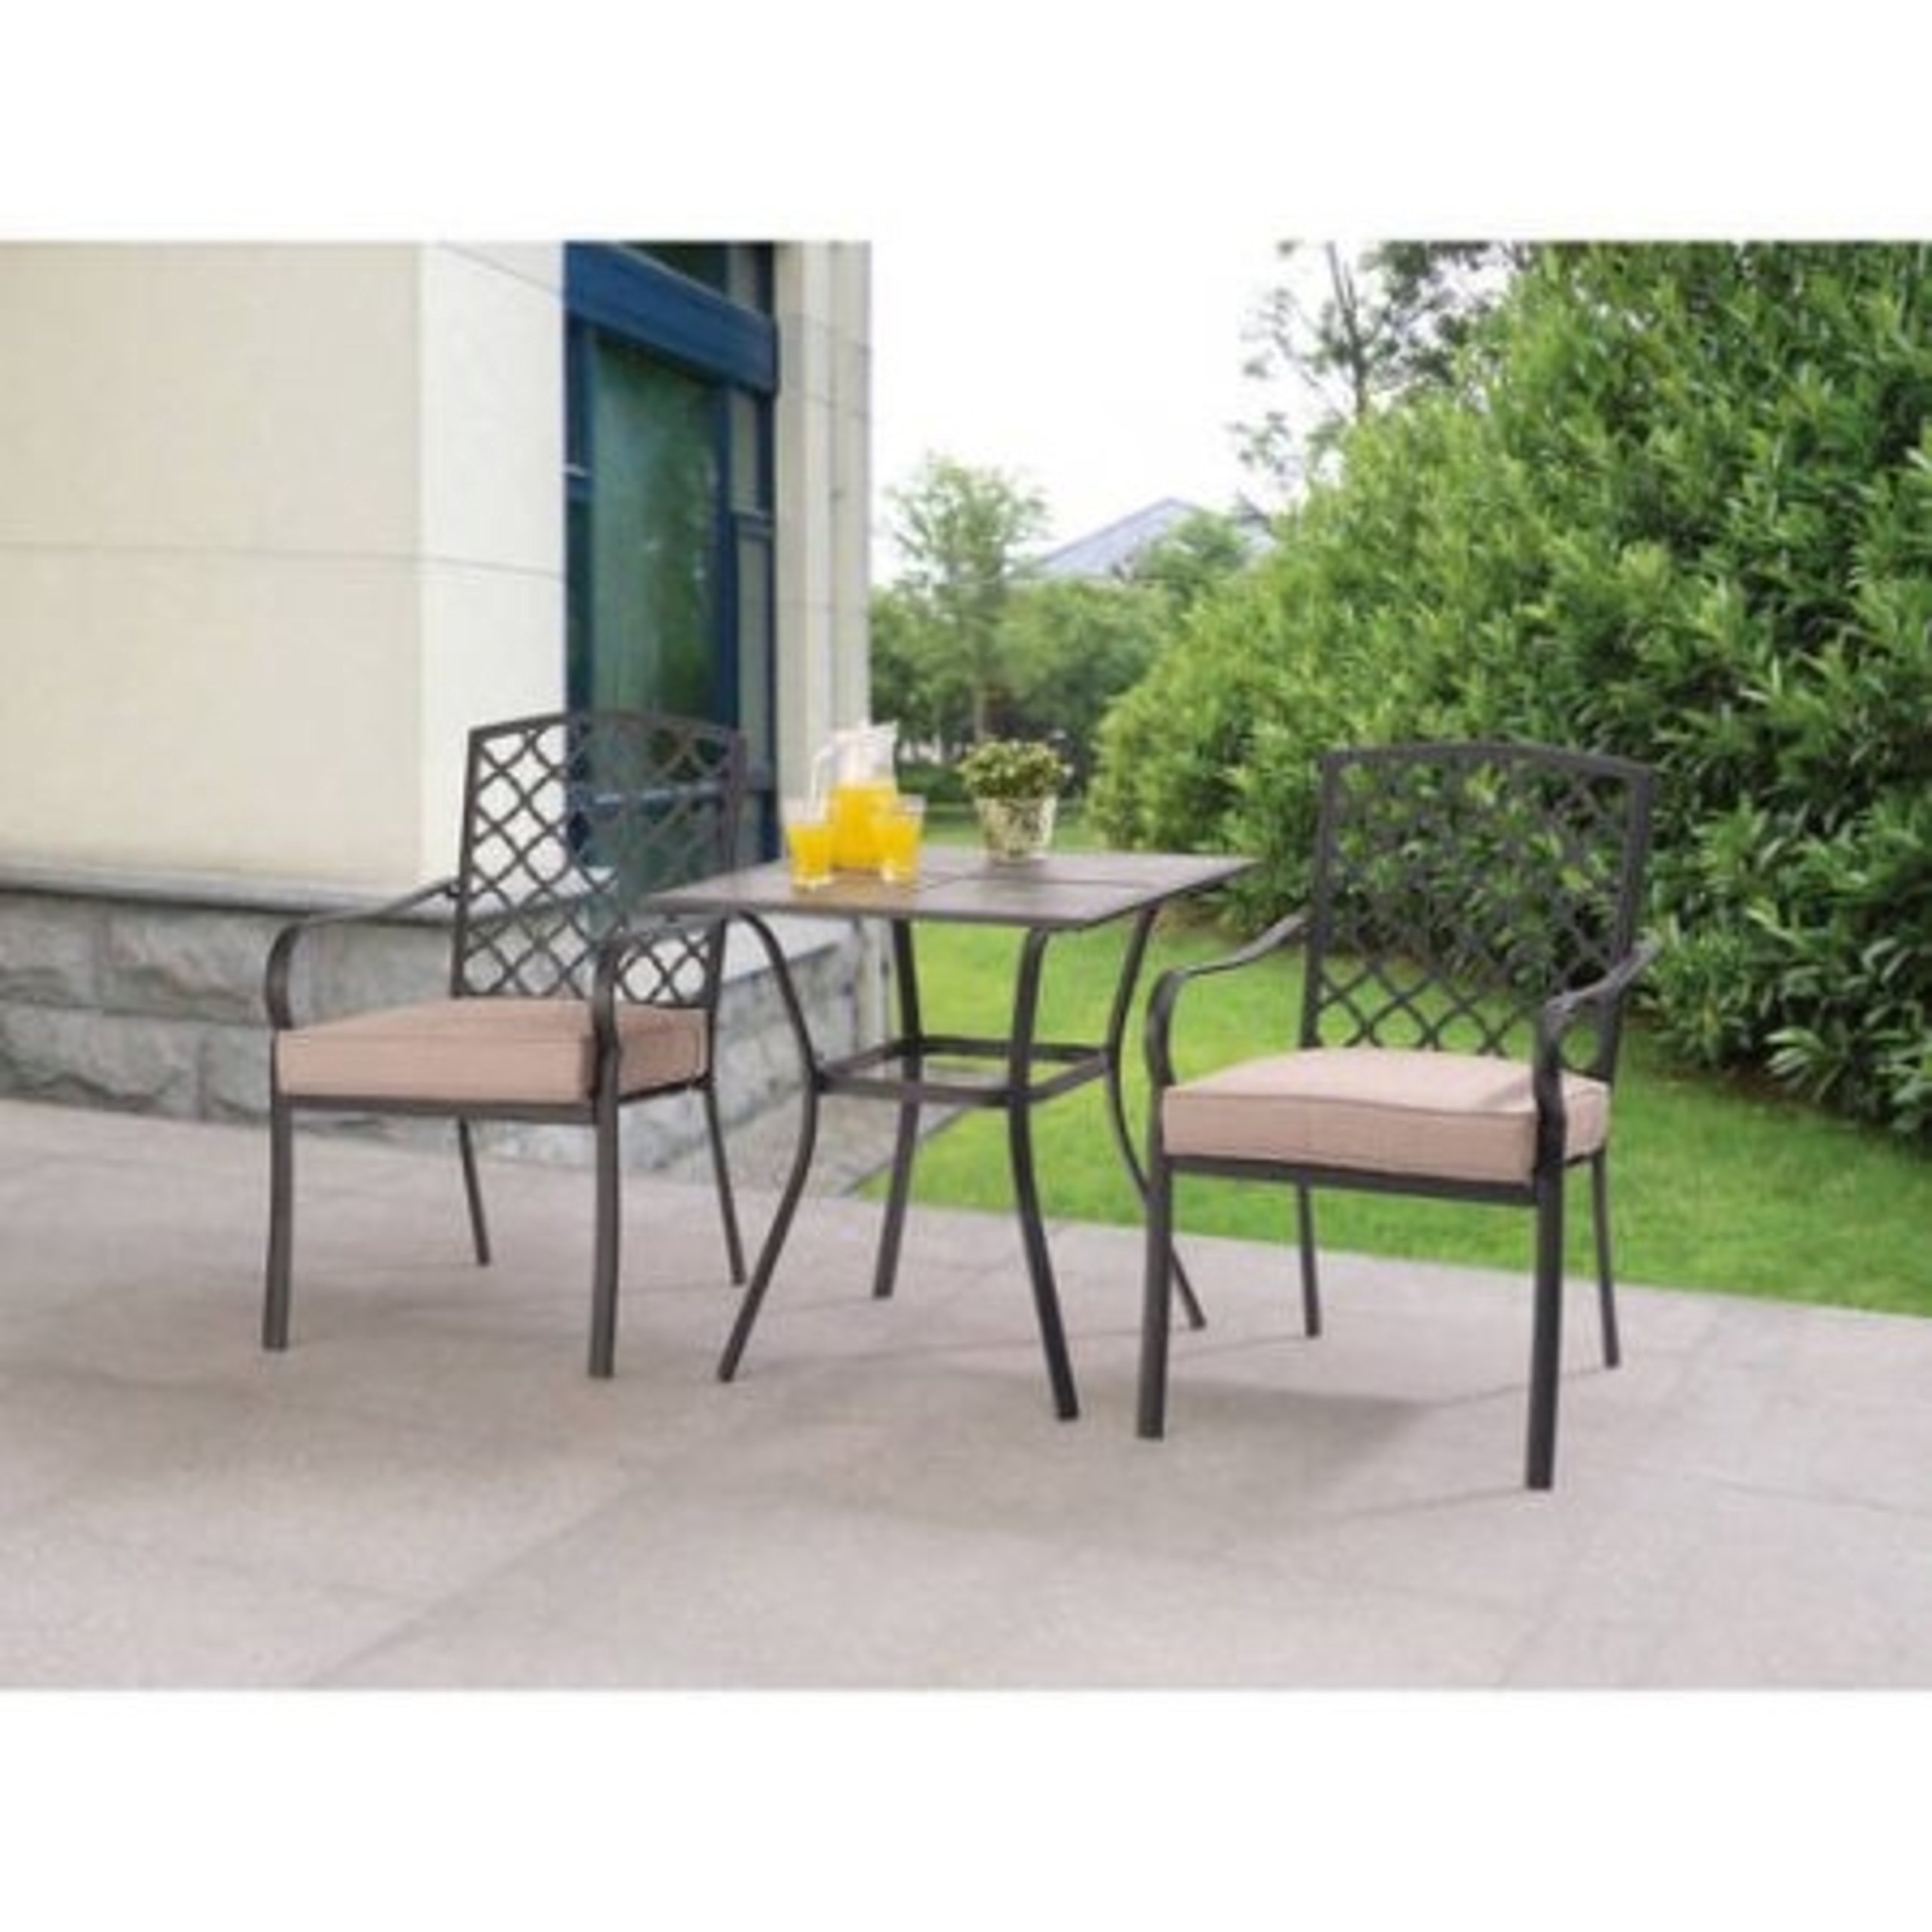 Ceramic Tile Tabletop Comfortable Ventilated Seating 3pc Tan Bistro Set